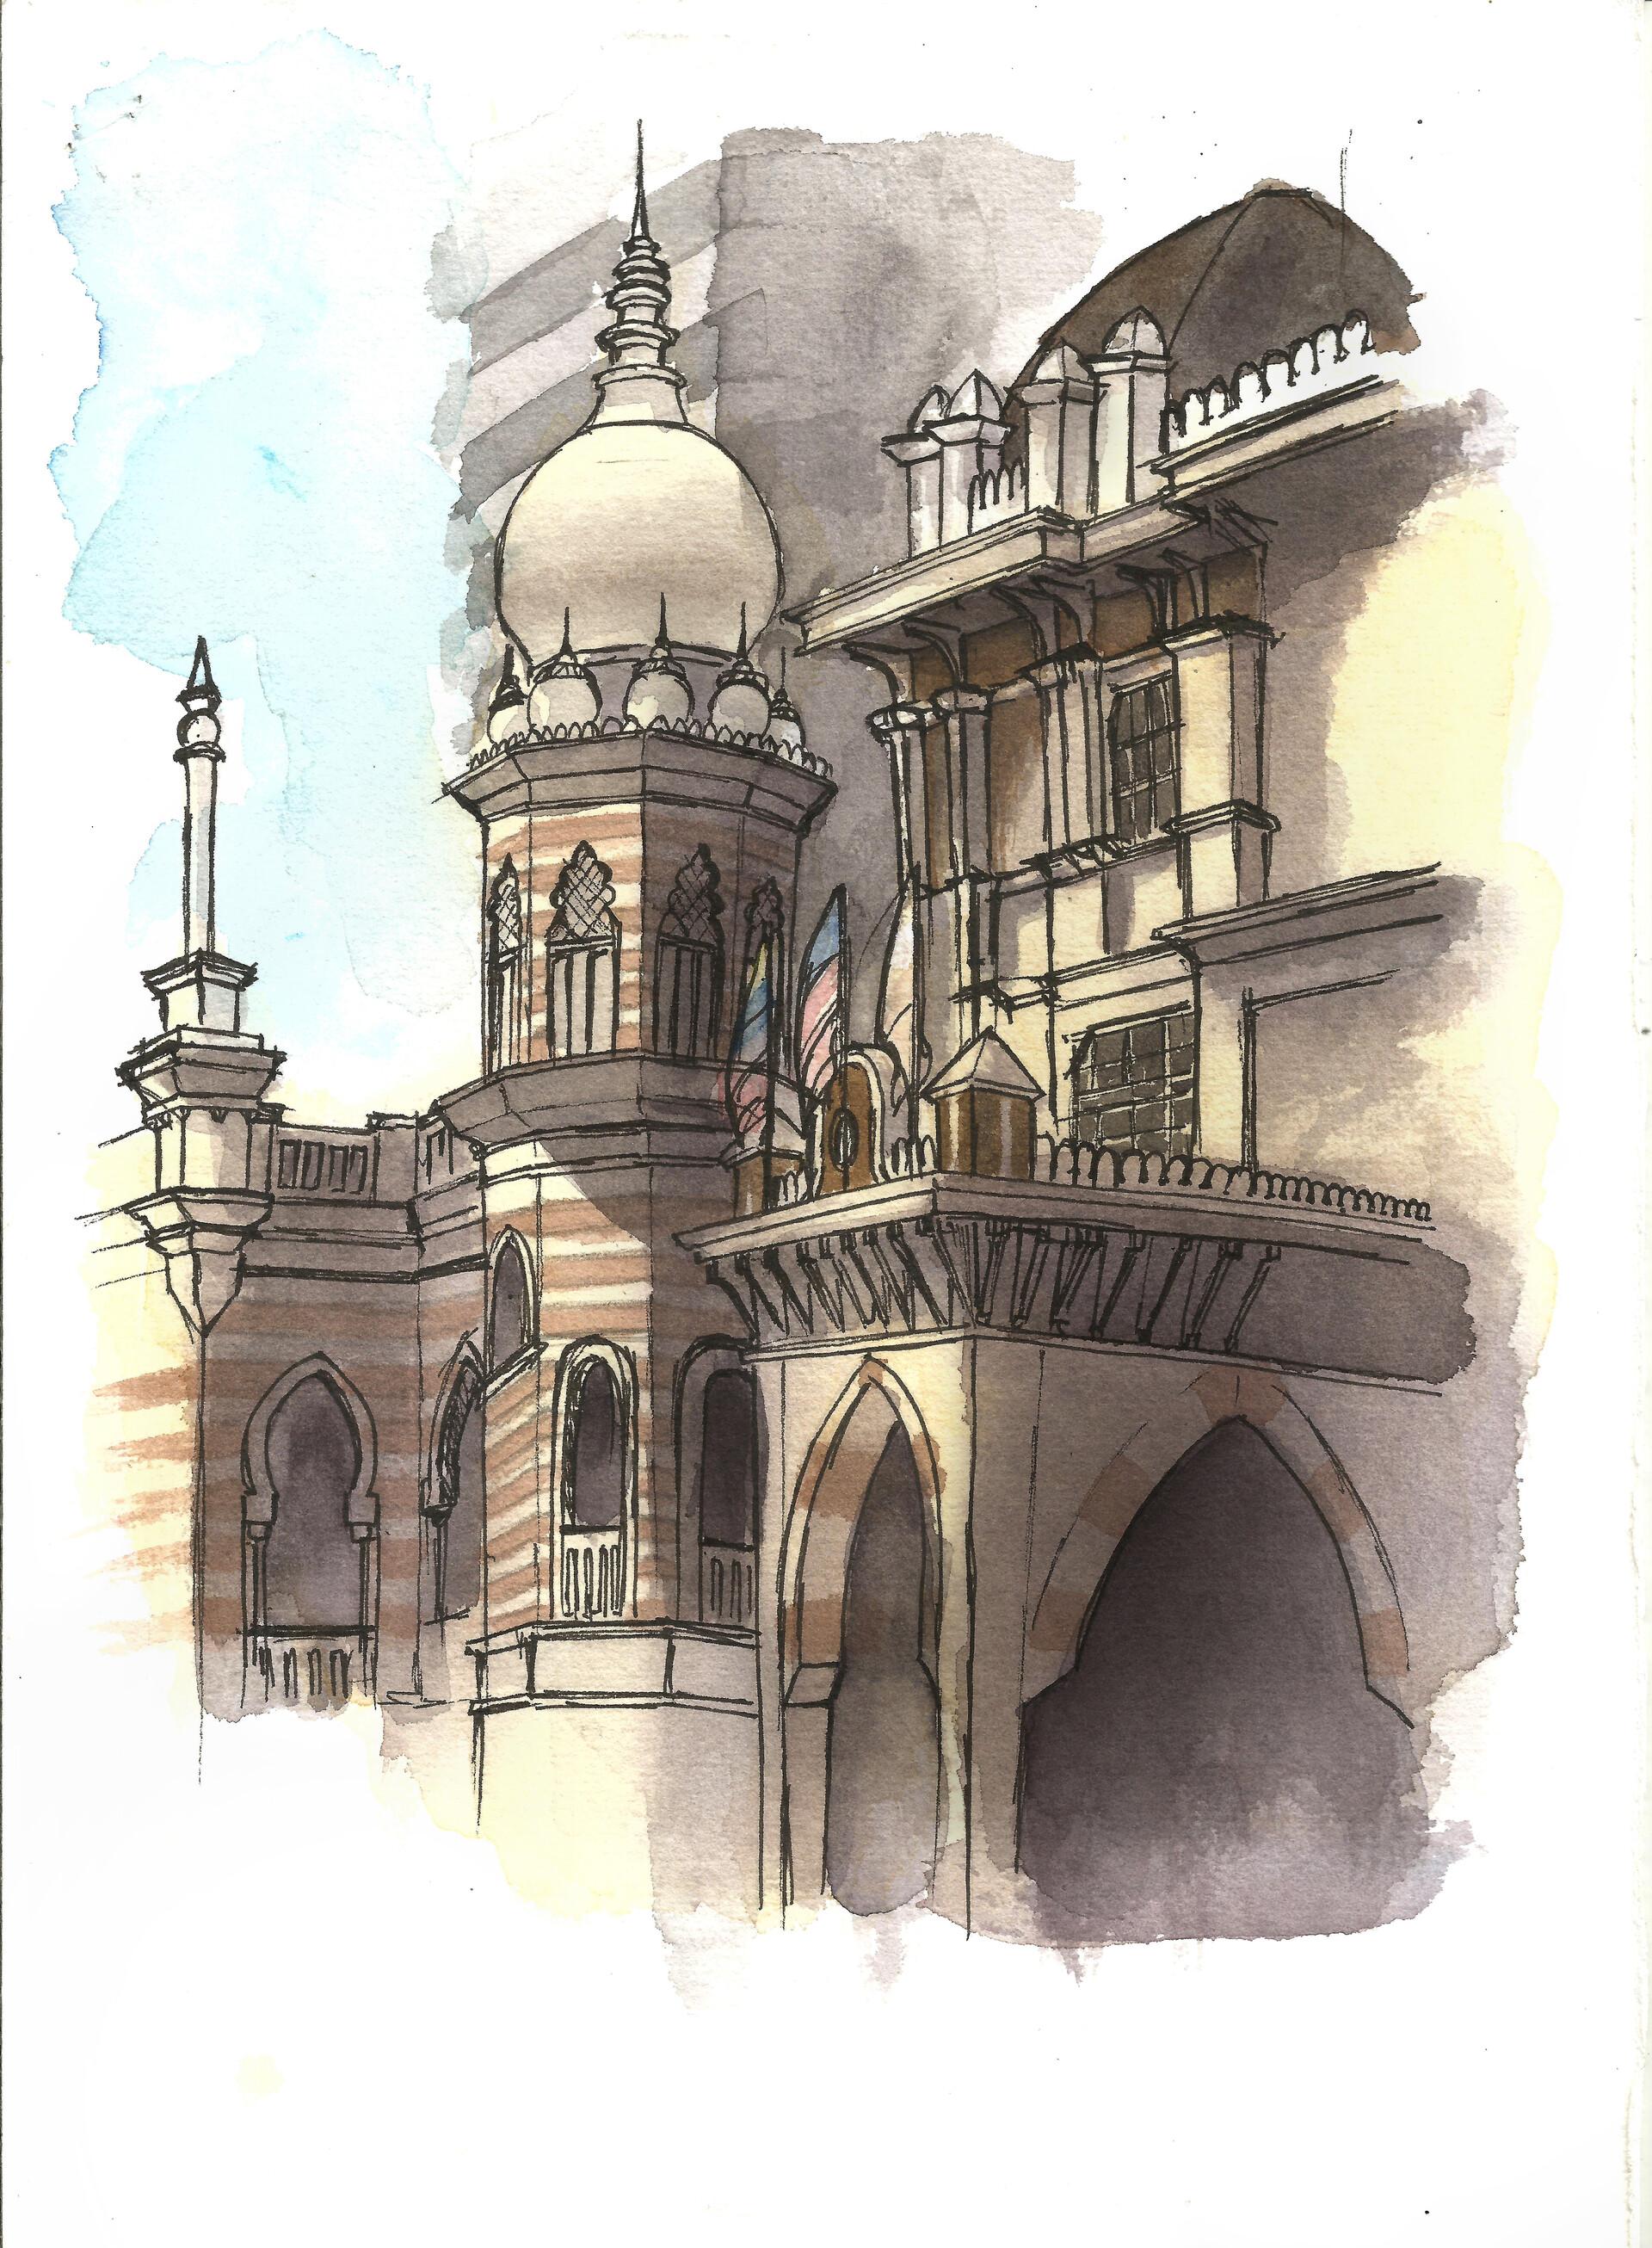 Artstation Watercolour Sketch Of Sultan Abdul Samad Building Kuala Lumpur Rebekah Wong